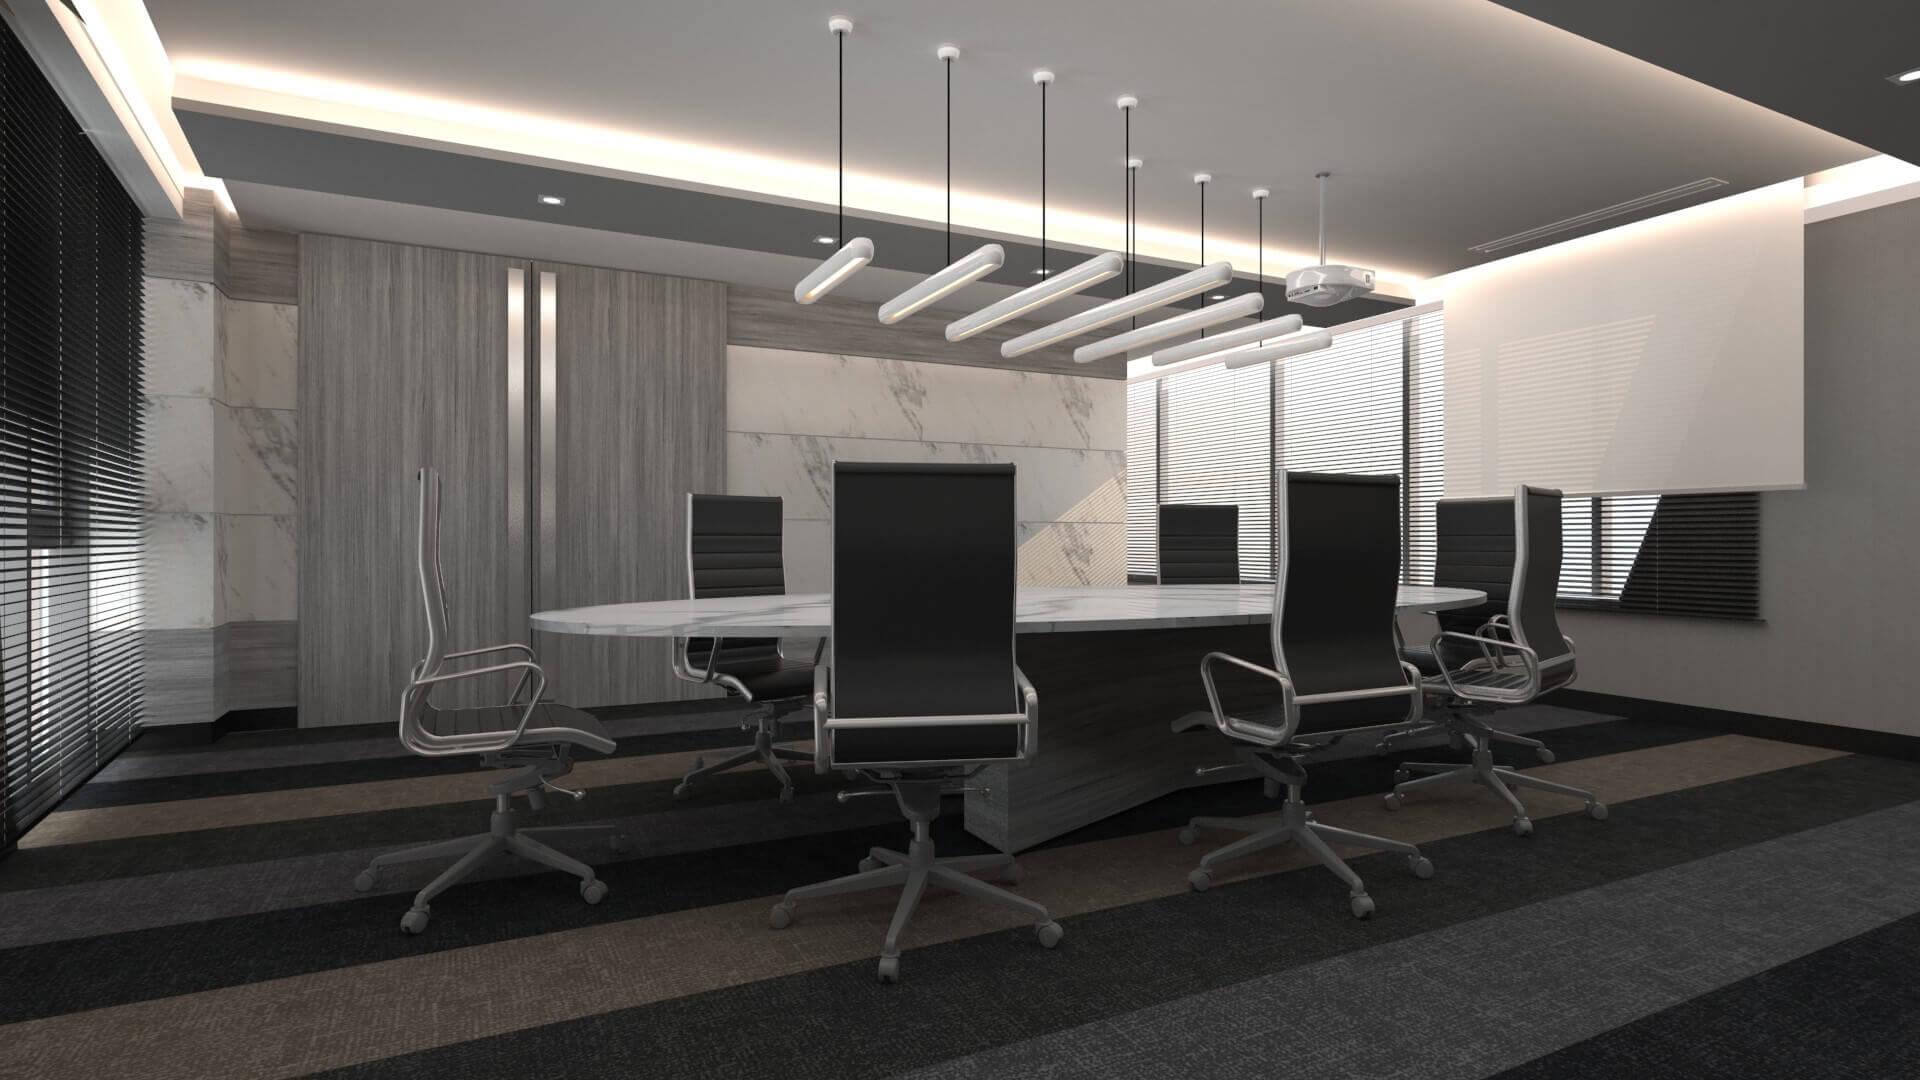 Ankara office architect 2431 Gisas Office Offices